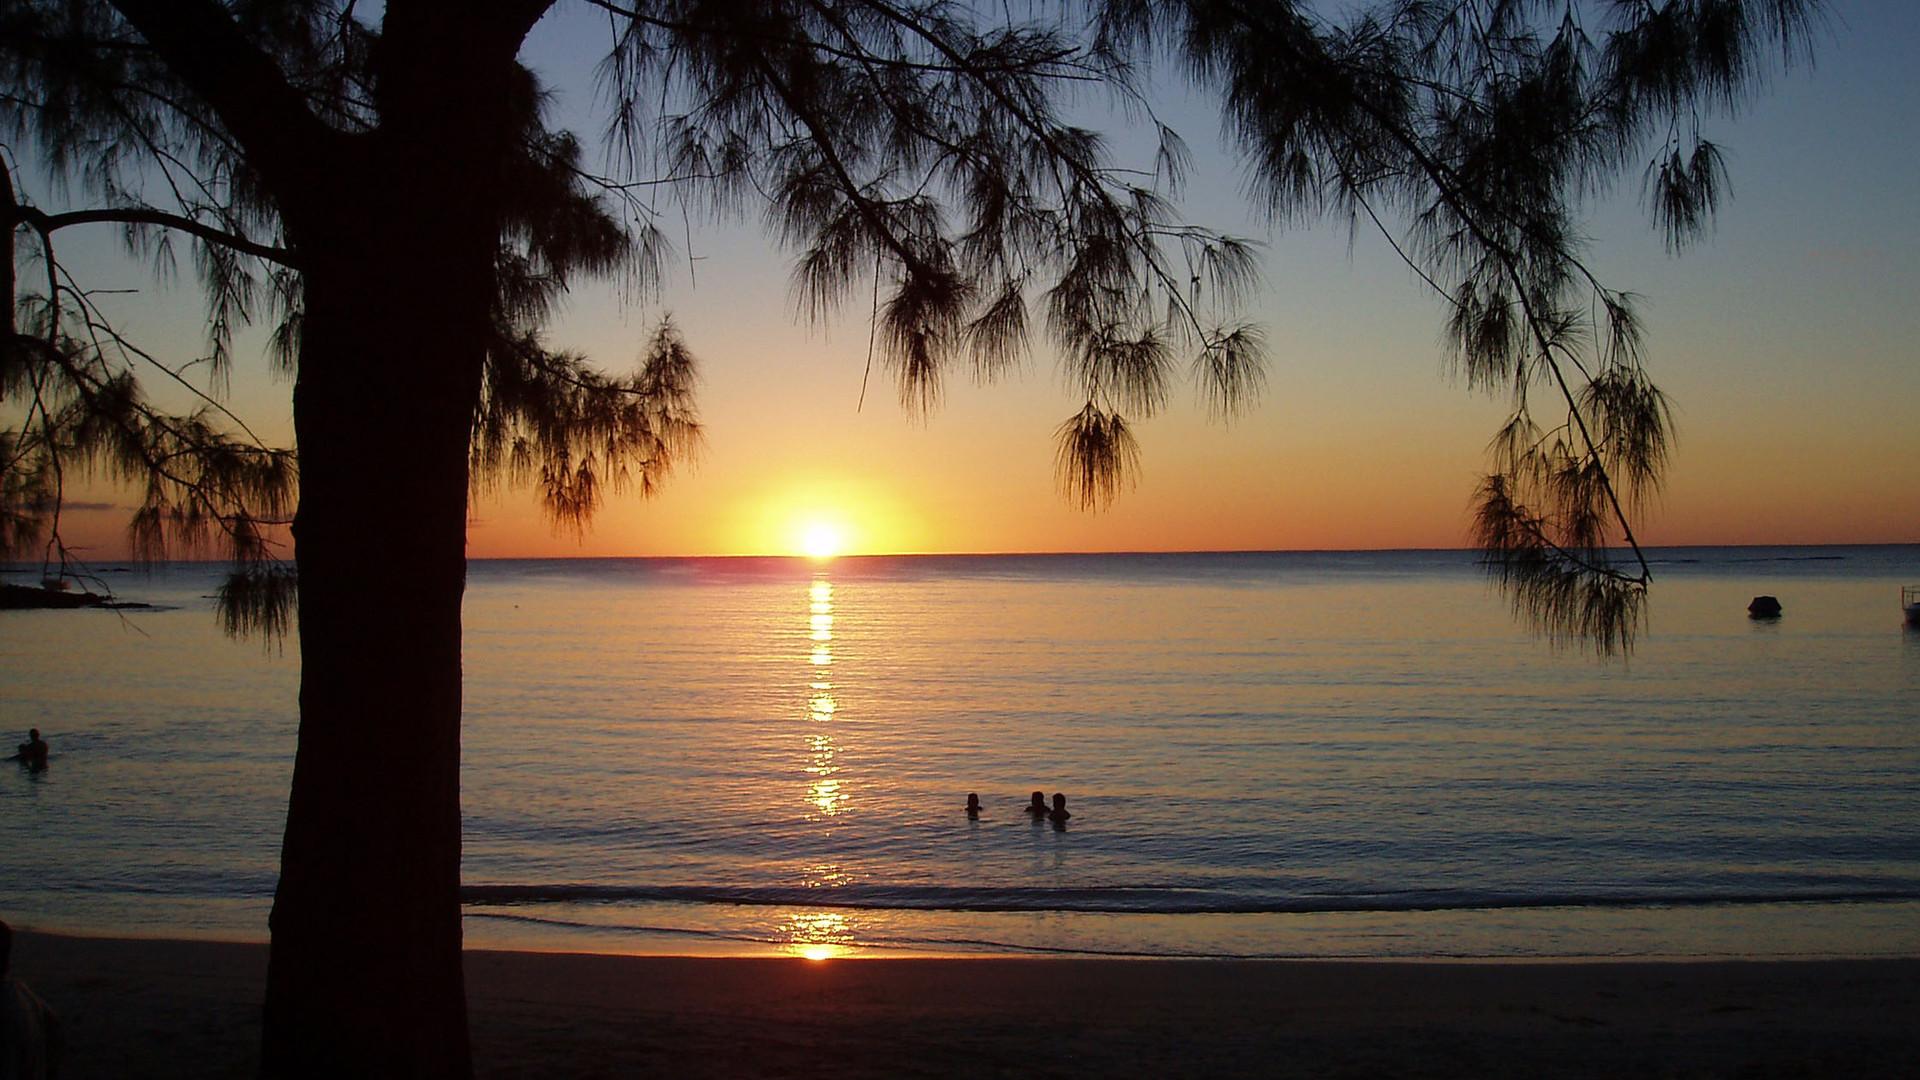 coucher de soleil a Pereybere